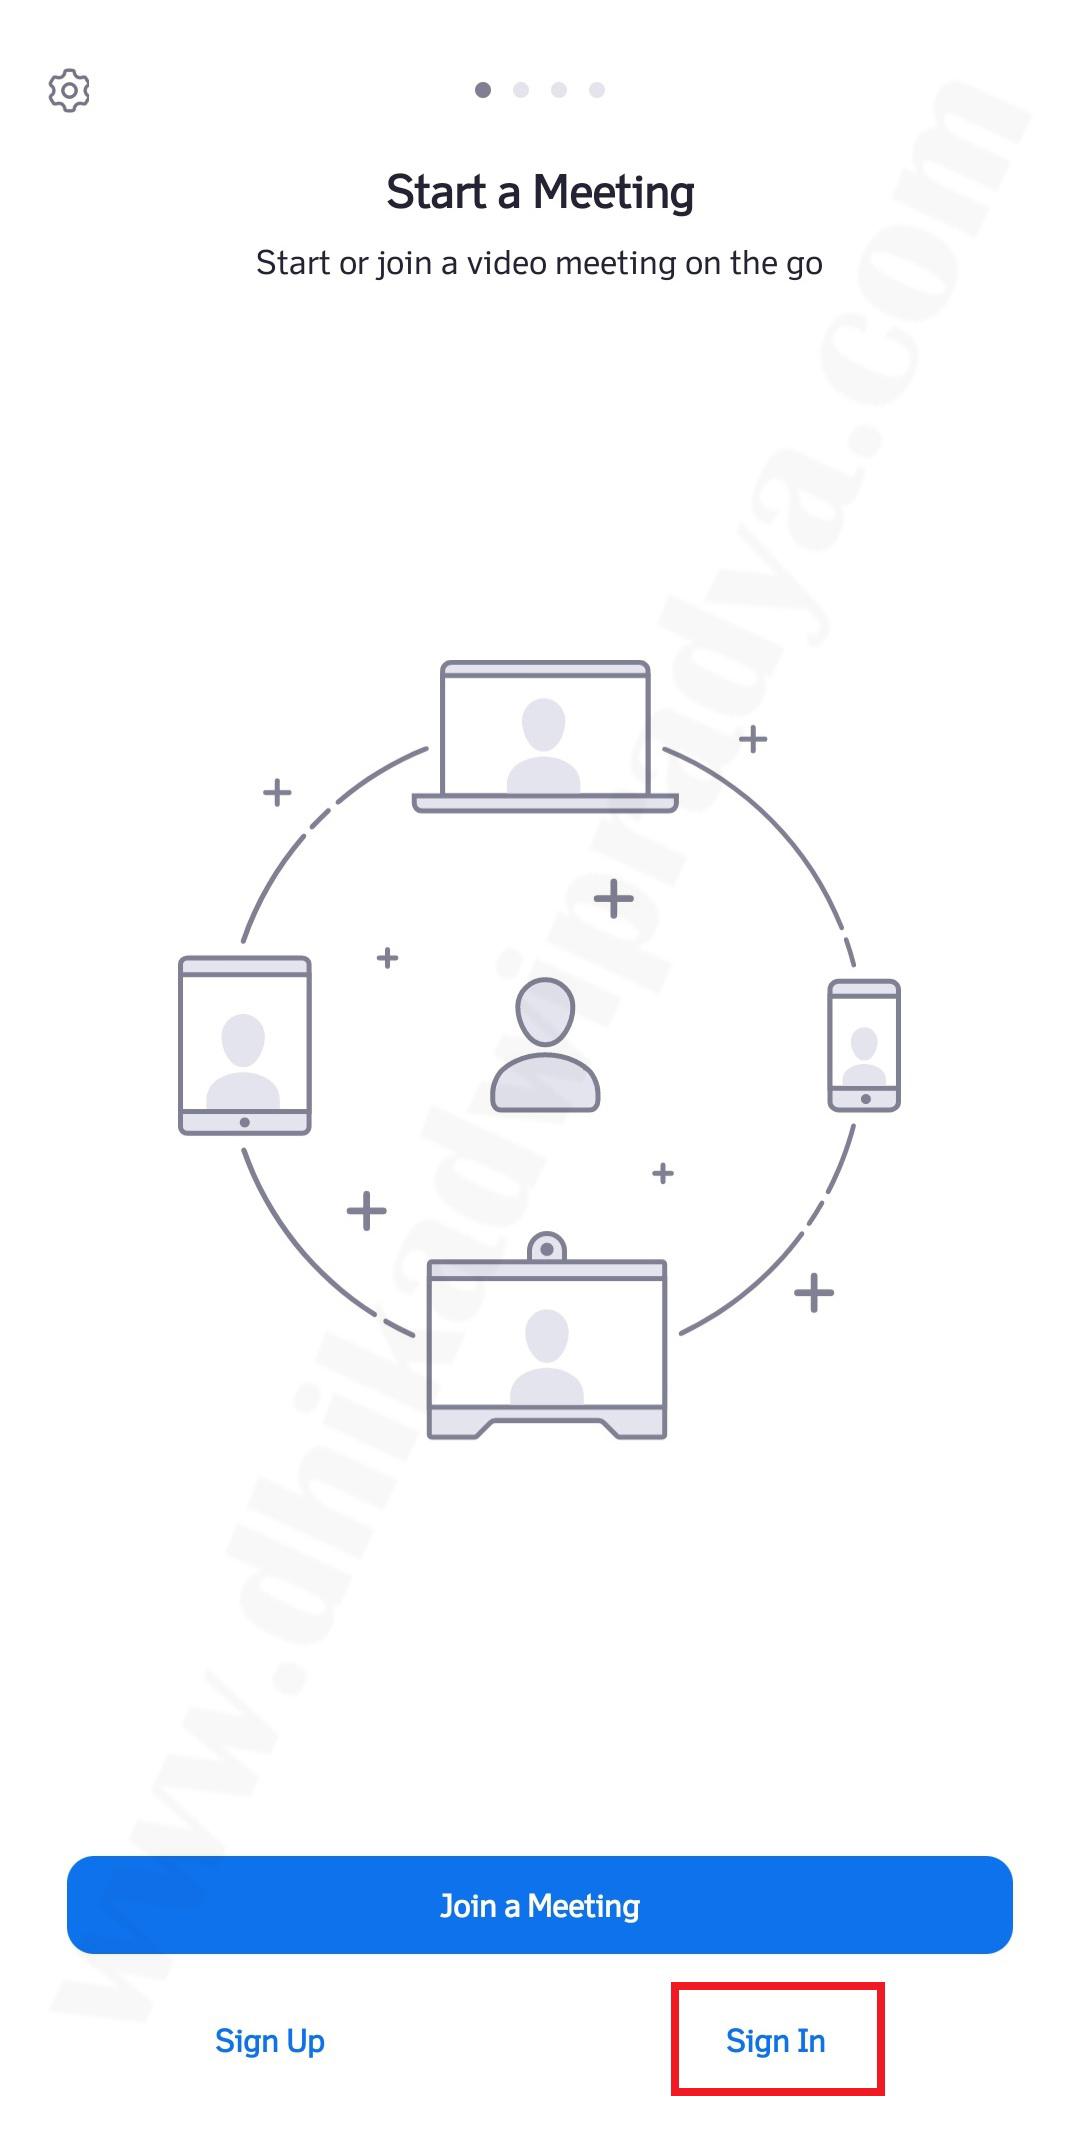 tutorial-cara-menggunakan-aplikasi-zoom-cloud-meeting1-dhikadwipradya